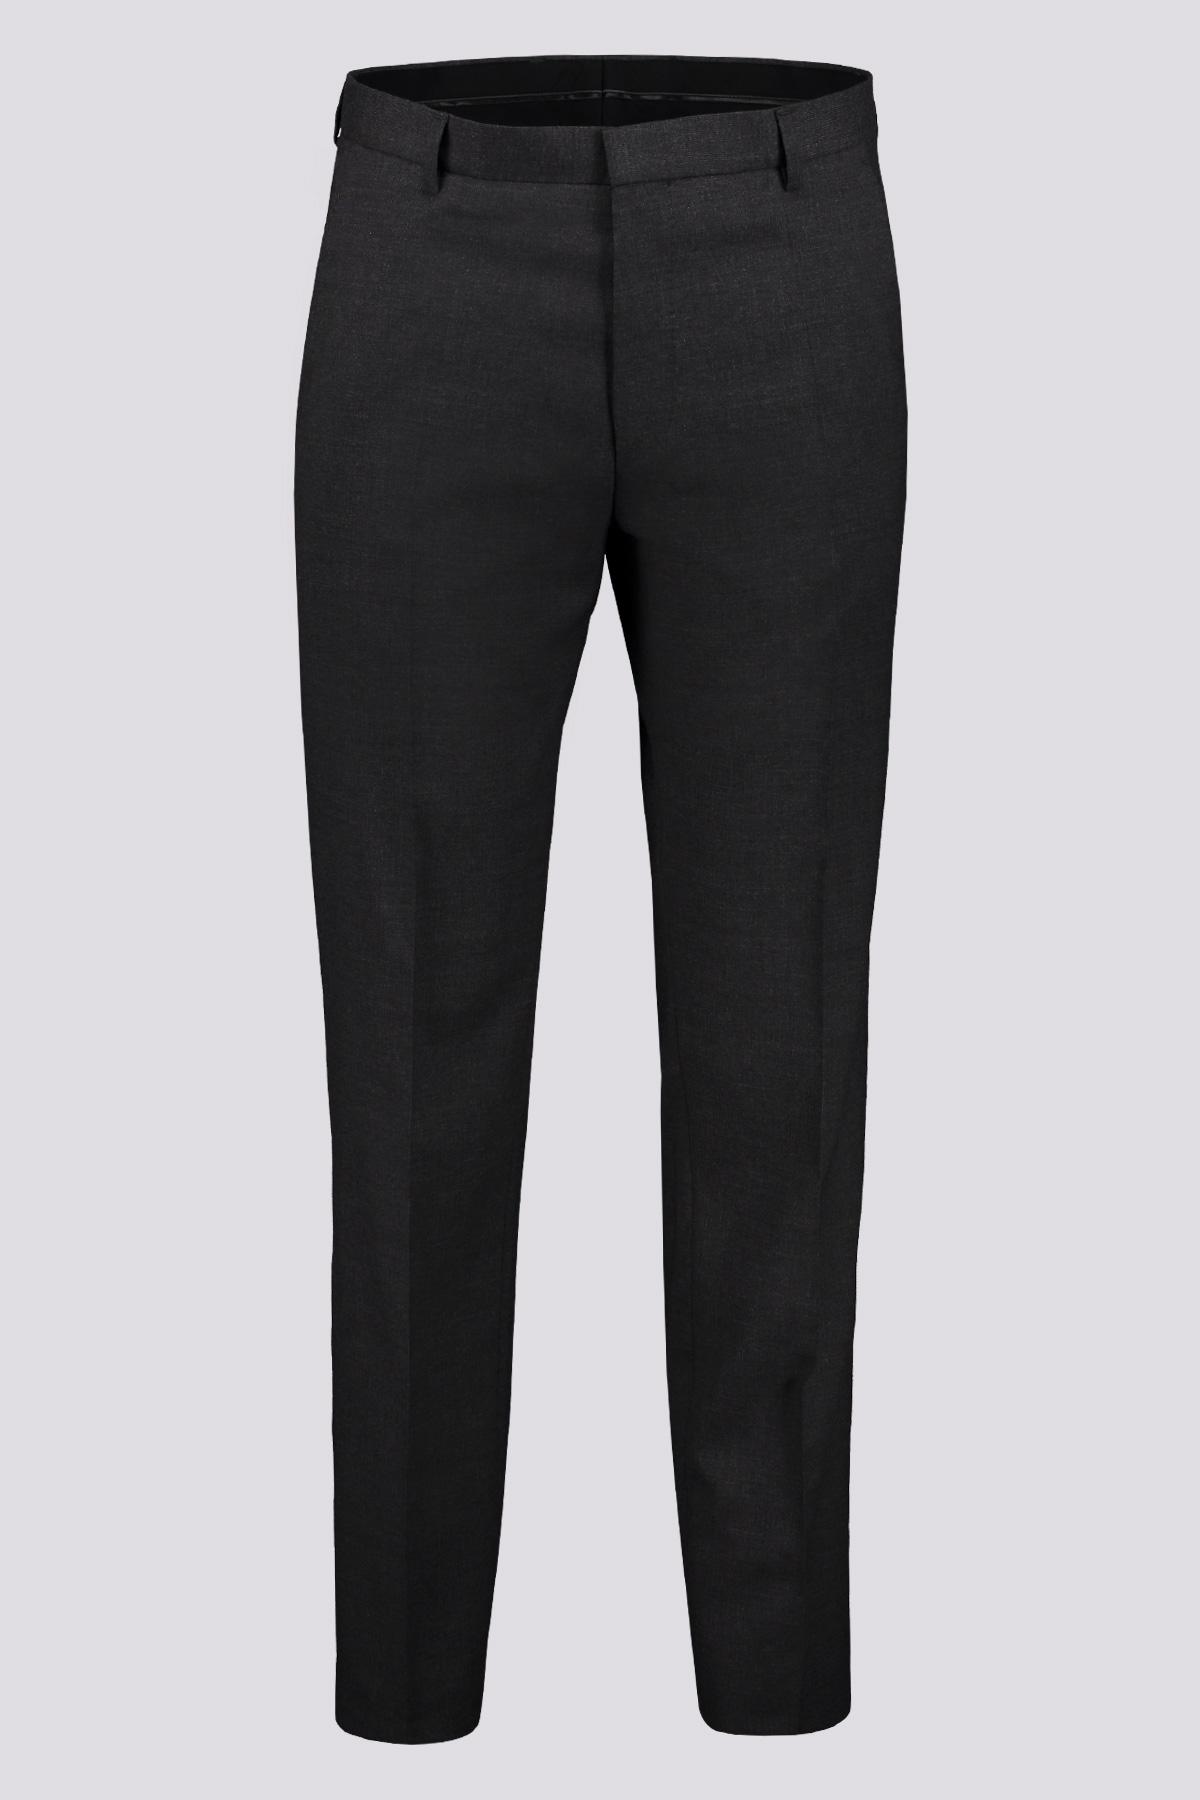 Pantalones de vestir marca BOSS 100% Lana